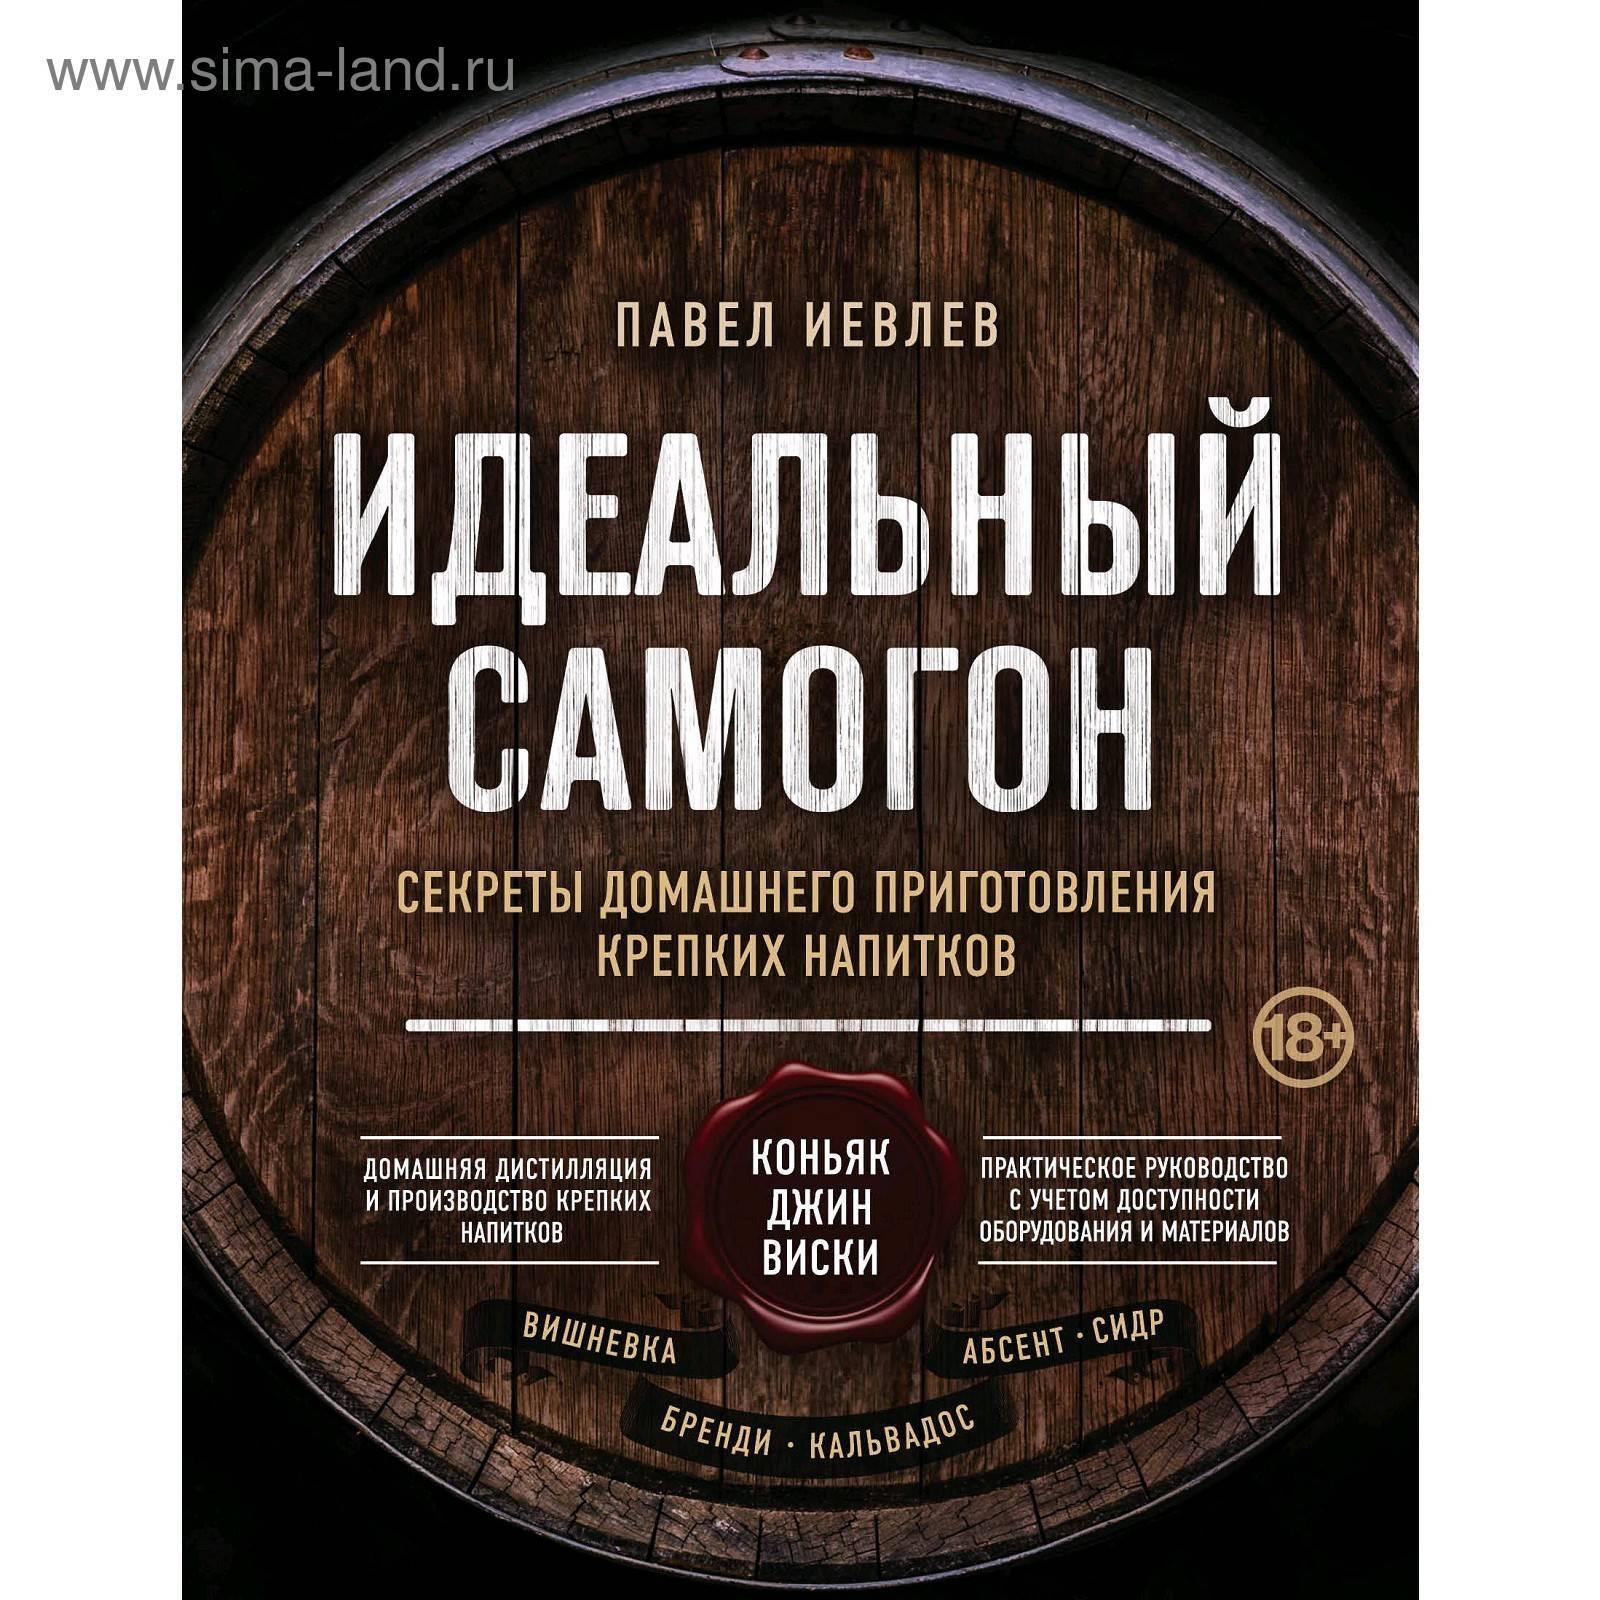 Напитки из самогона - виски, ром, коньяк, текила